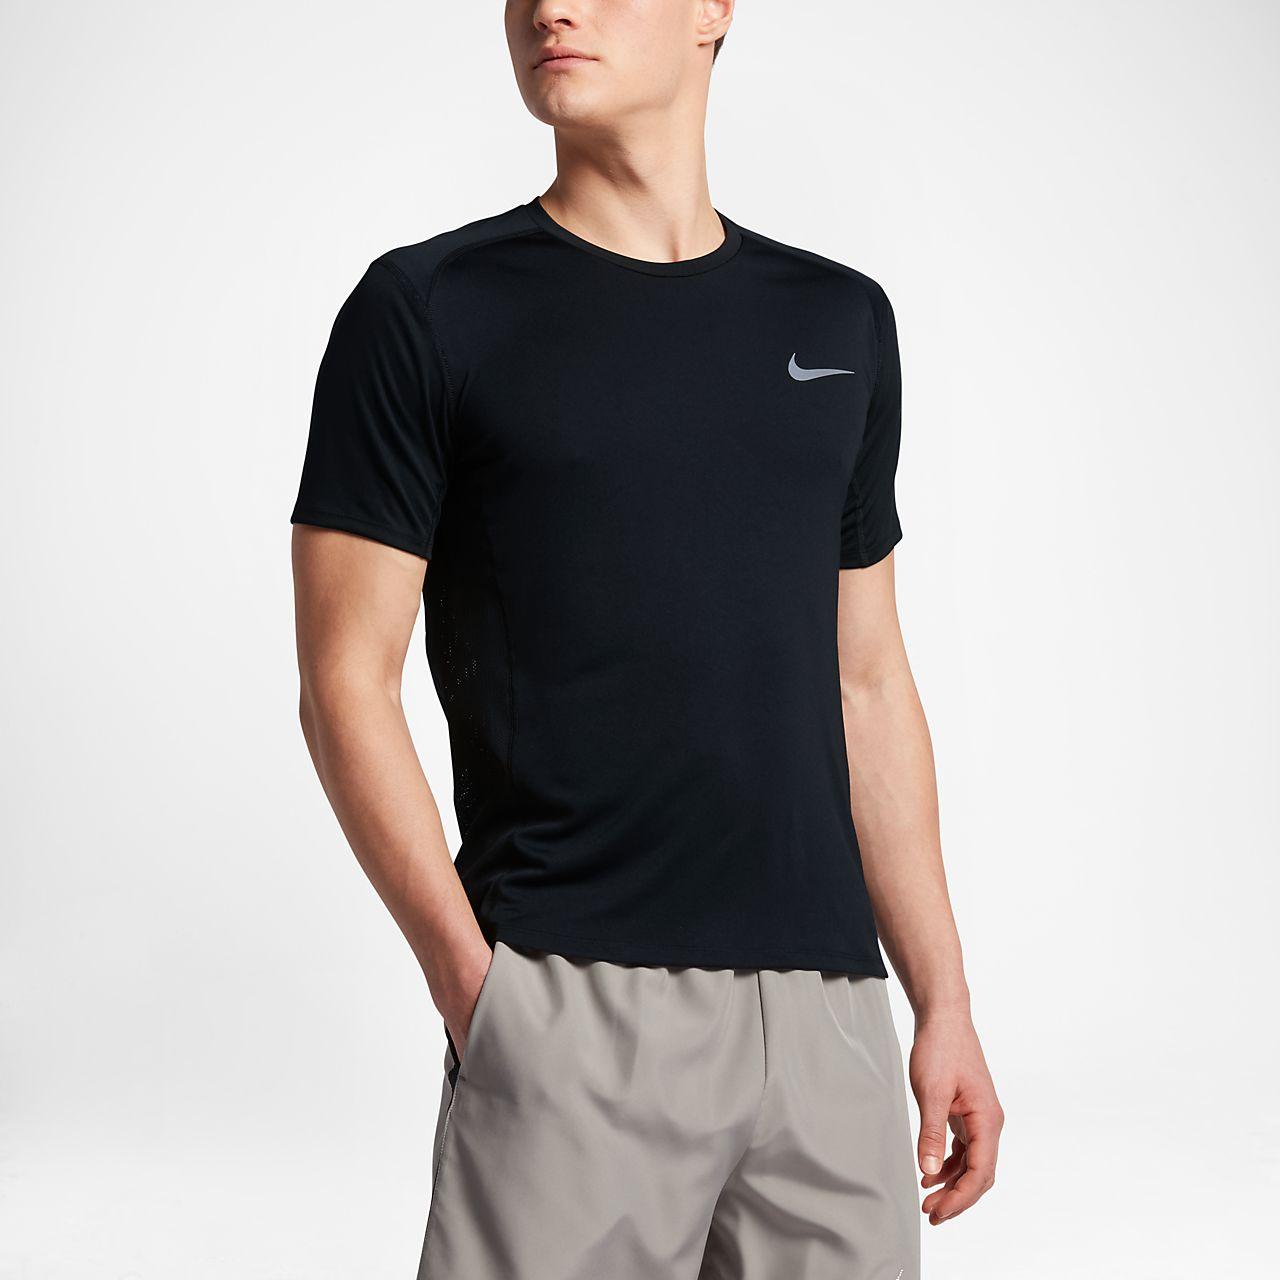 994ae2f69a Nike Miler Men s Short Sleeve Running Top. Nike.com